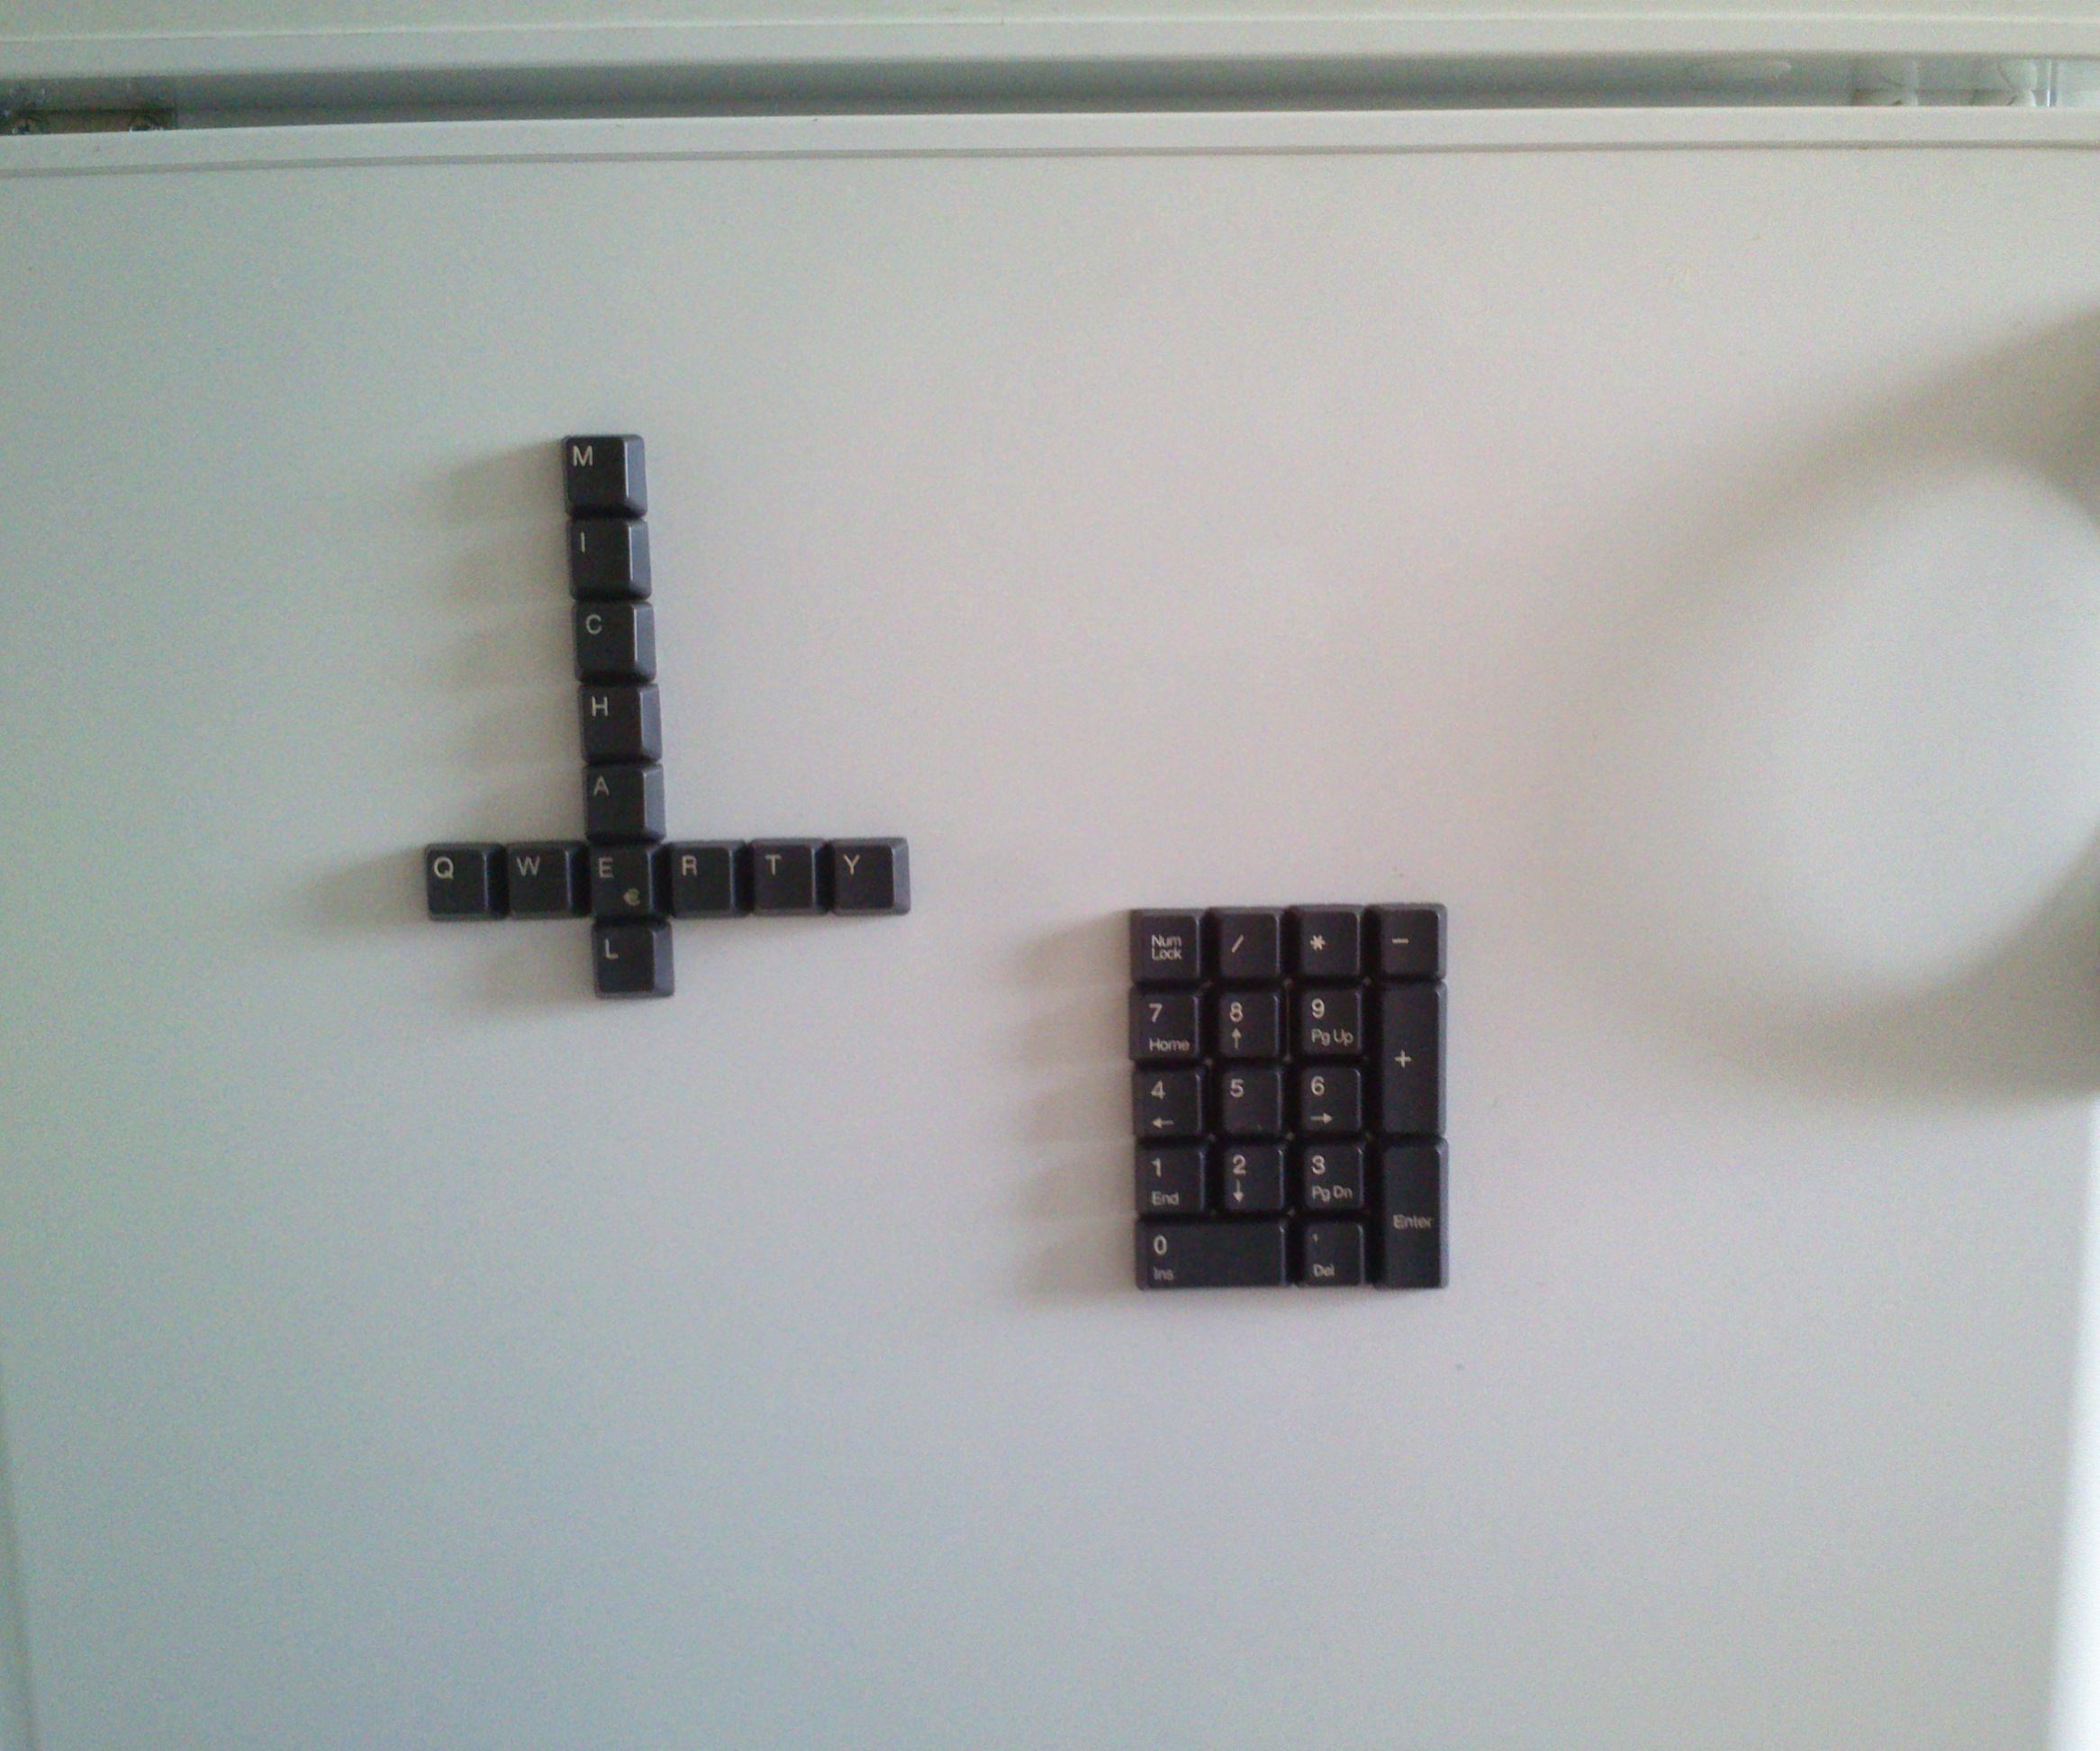 Easy keyboard fridge magnets